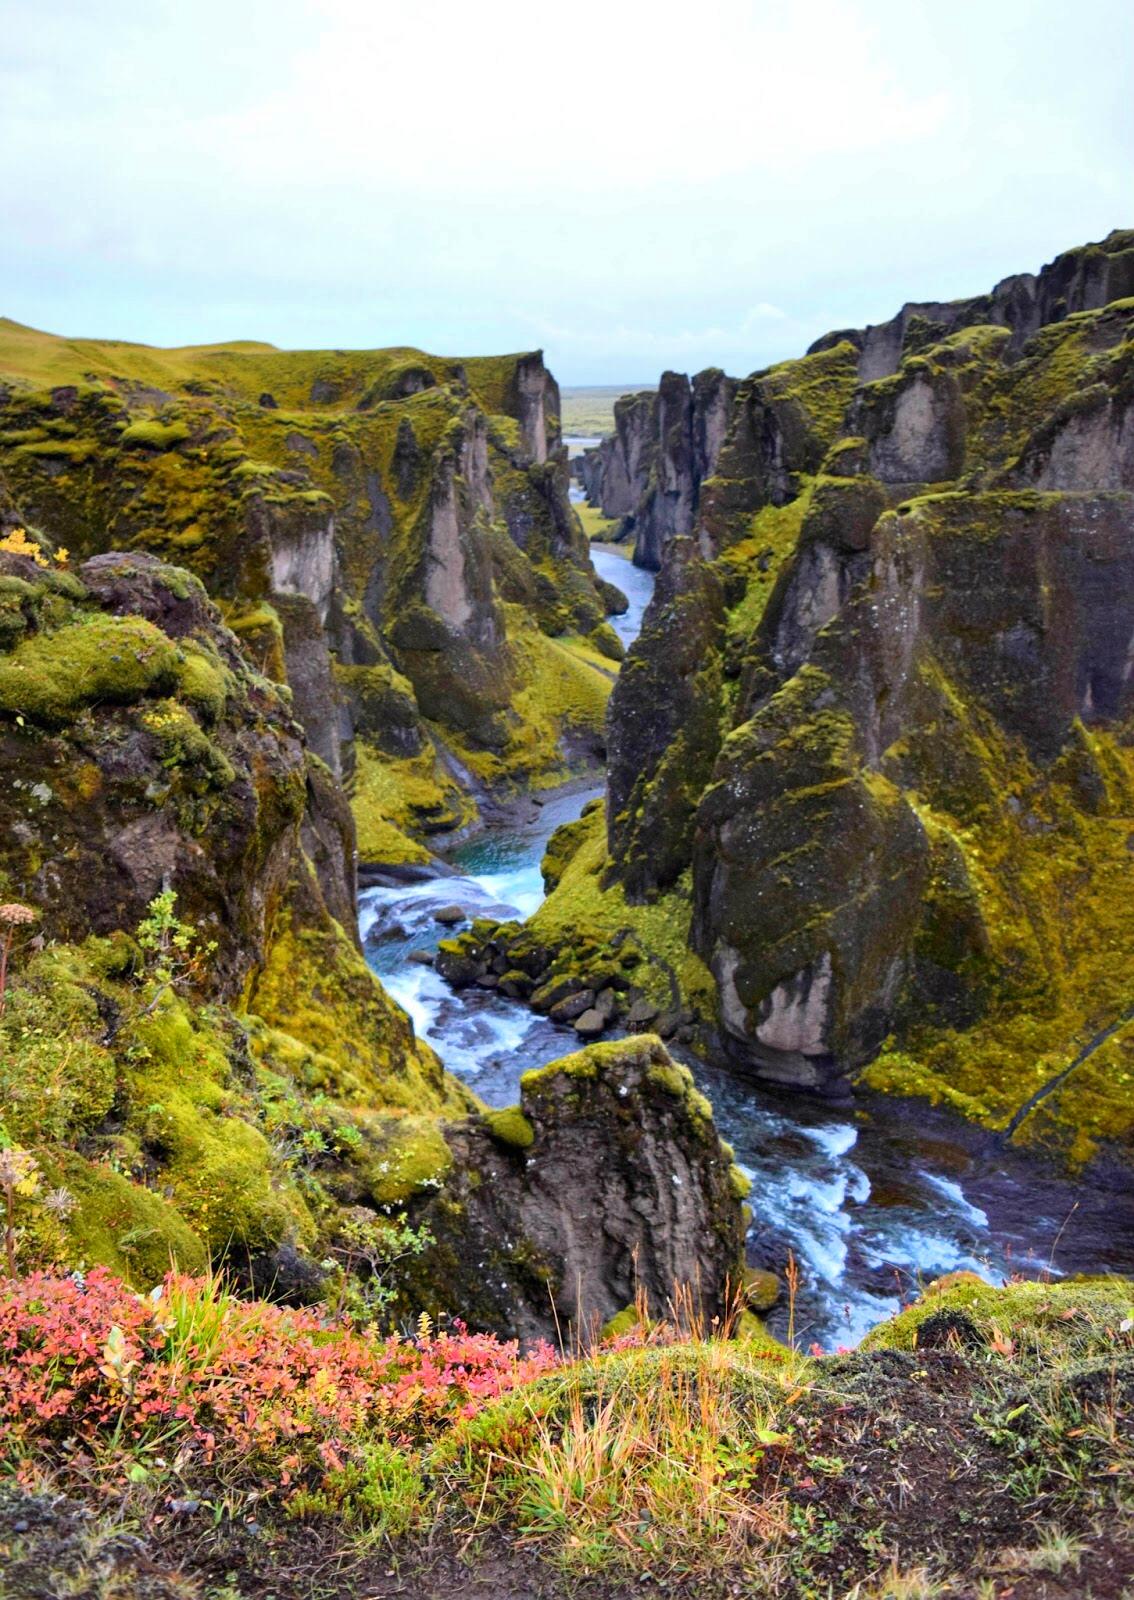 Fjaðrárgljúfur Canyon, carved by glacier runoff over thousands of years